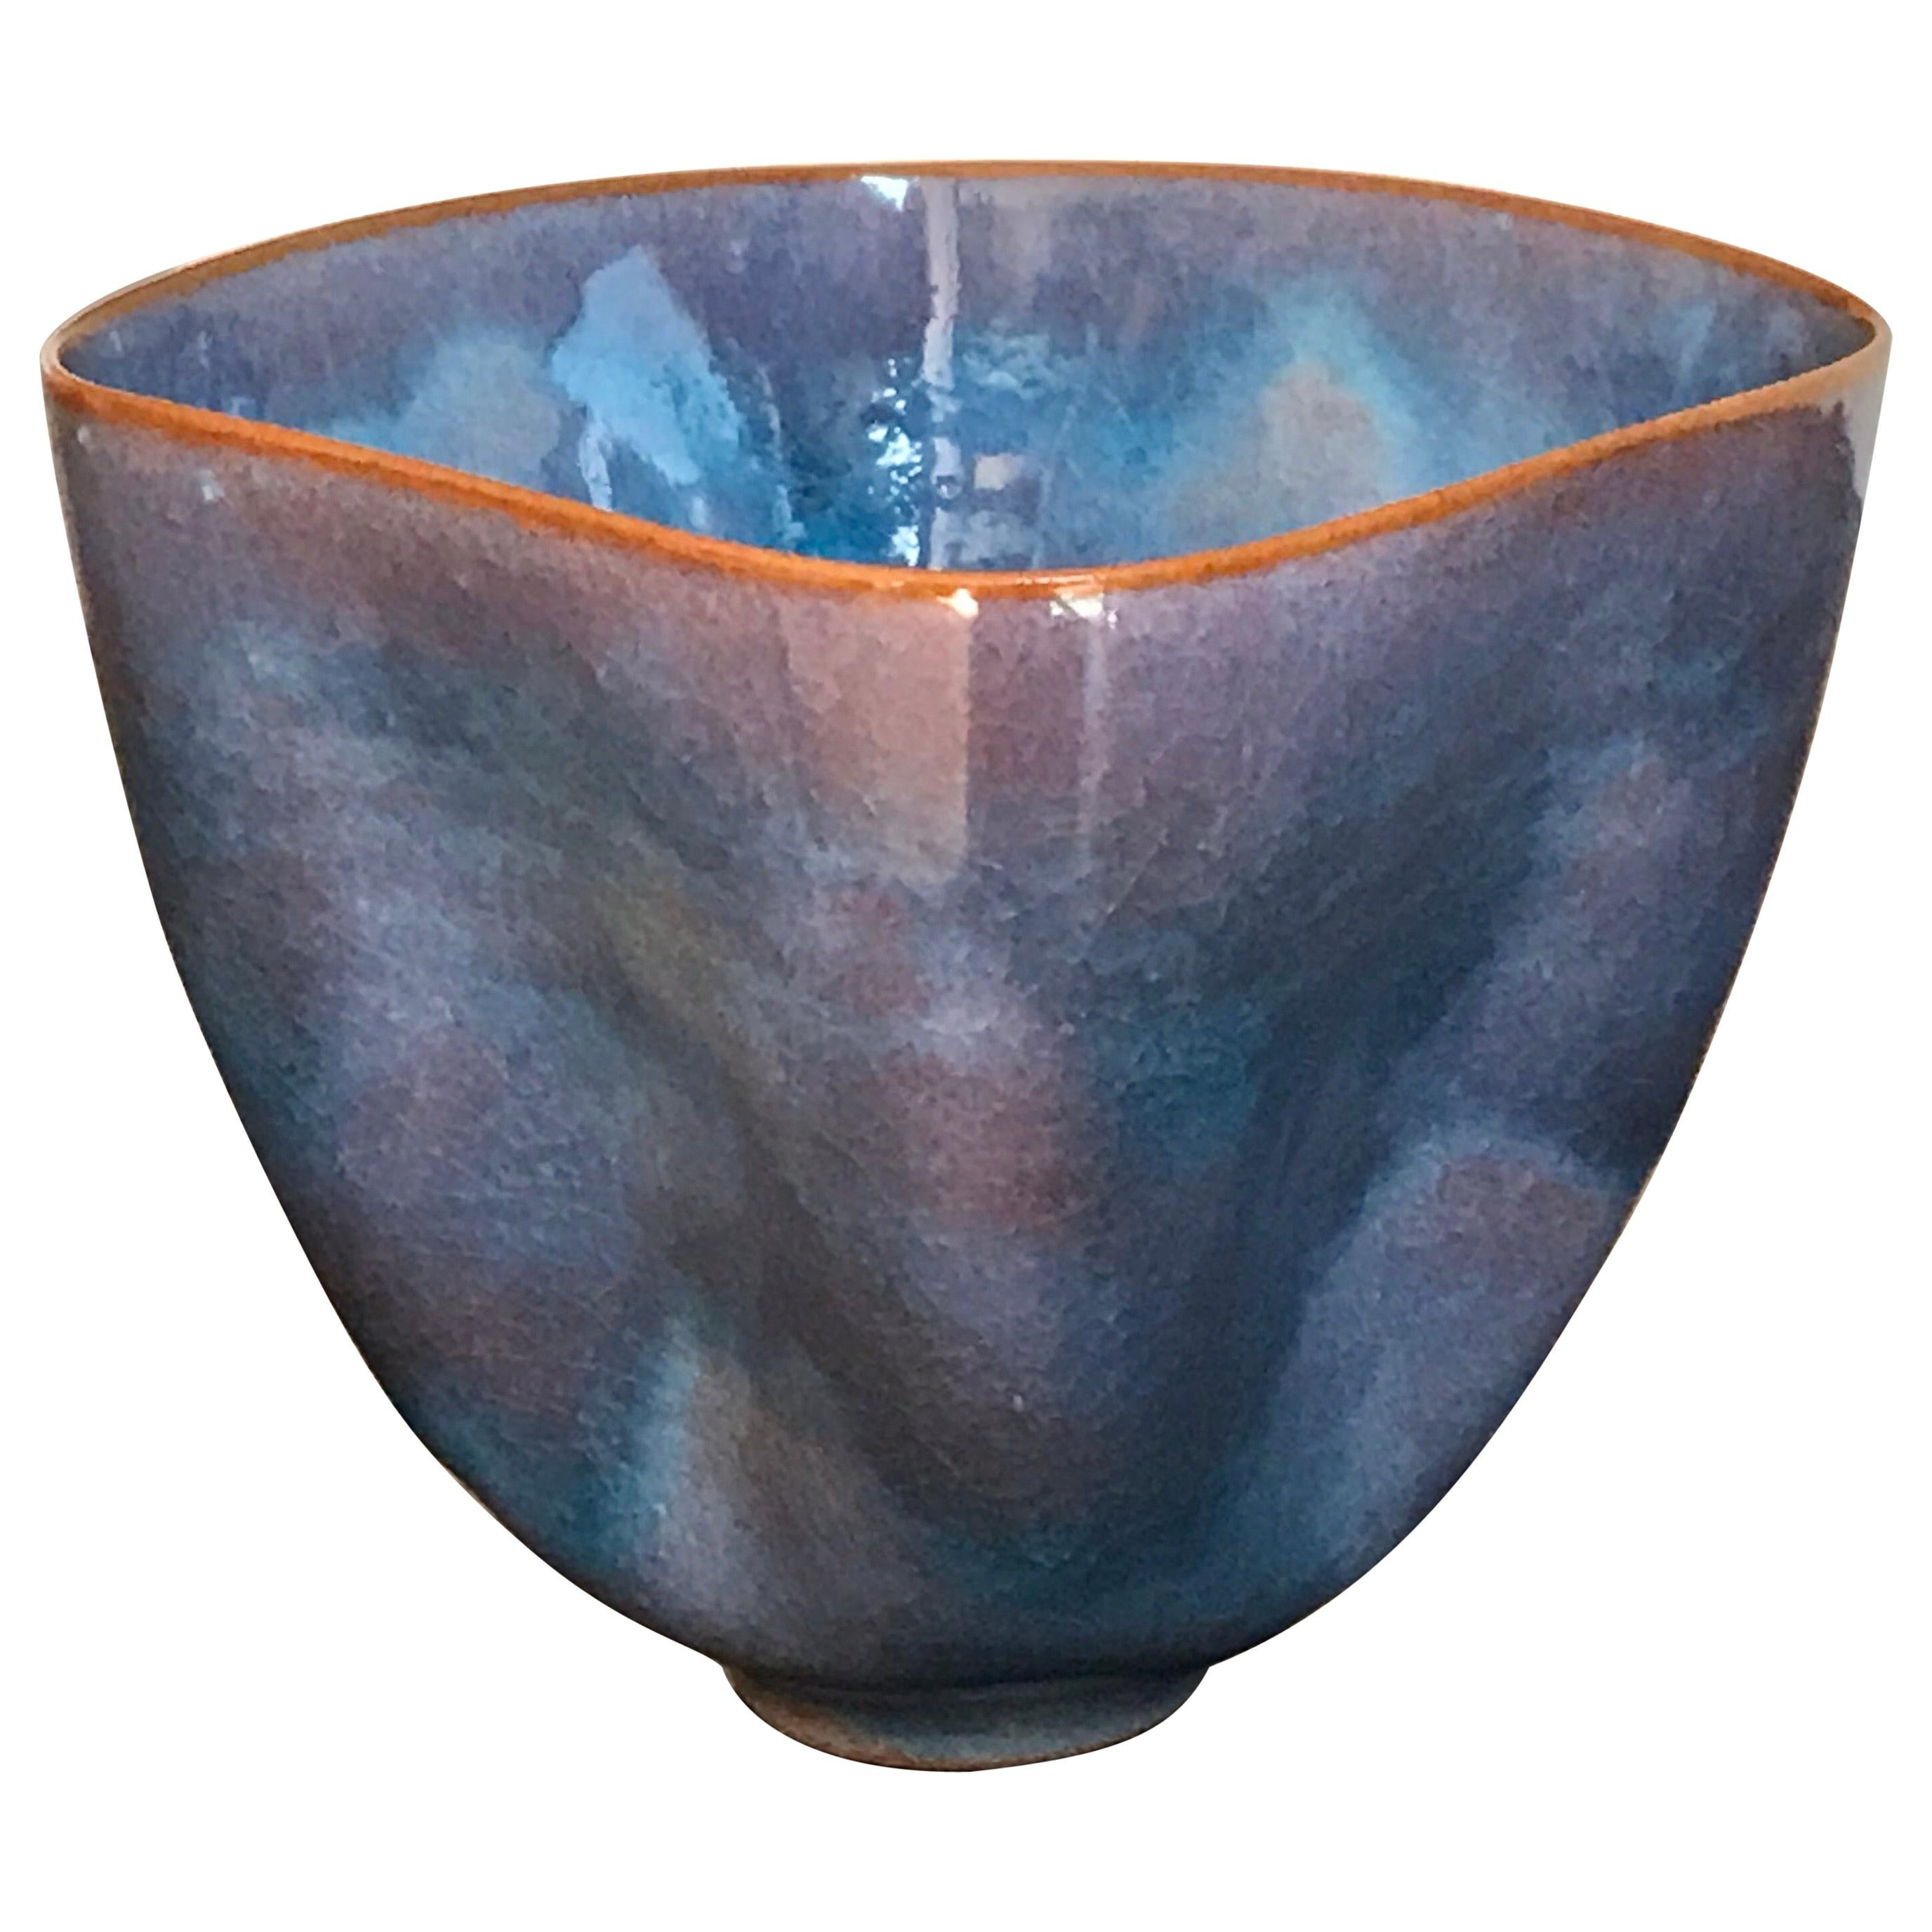 Gertrud and Otto Natzler Studio Pottery Pinch Pot